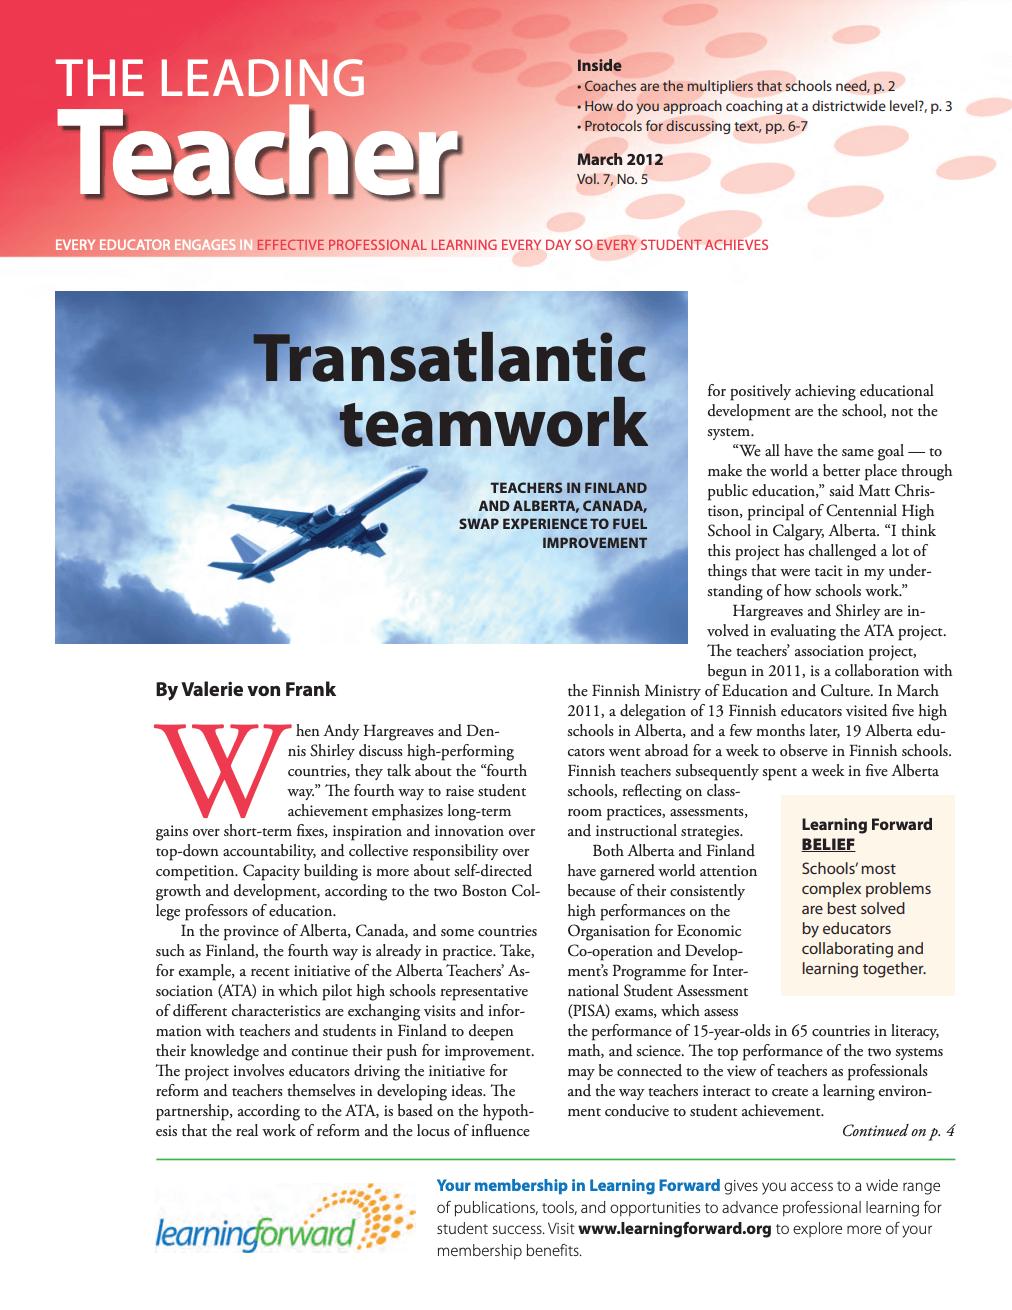 the-leading-teacher-march-2012-vol-7-no-5